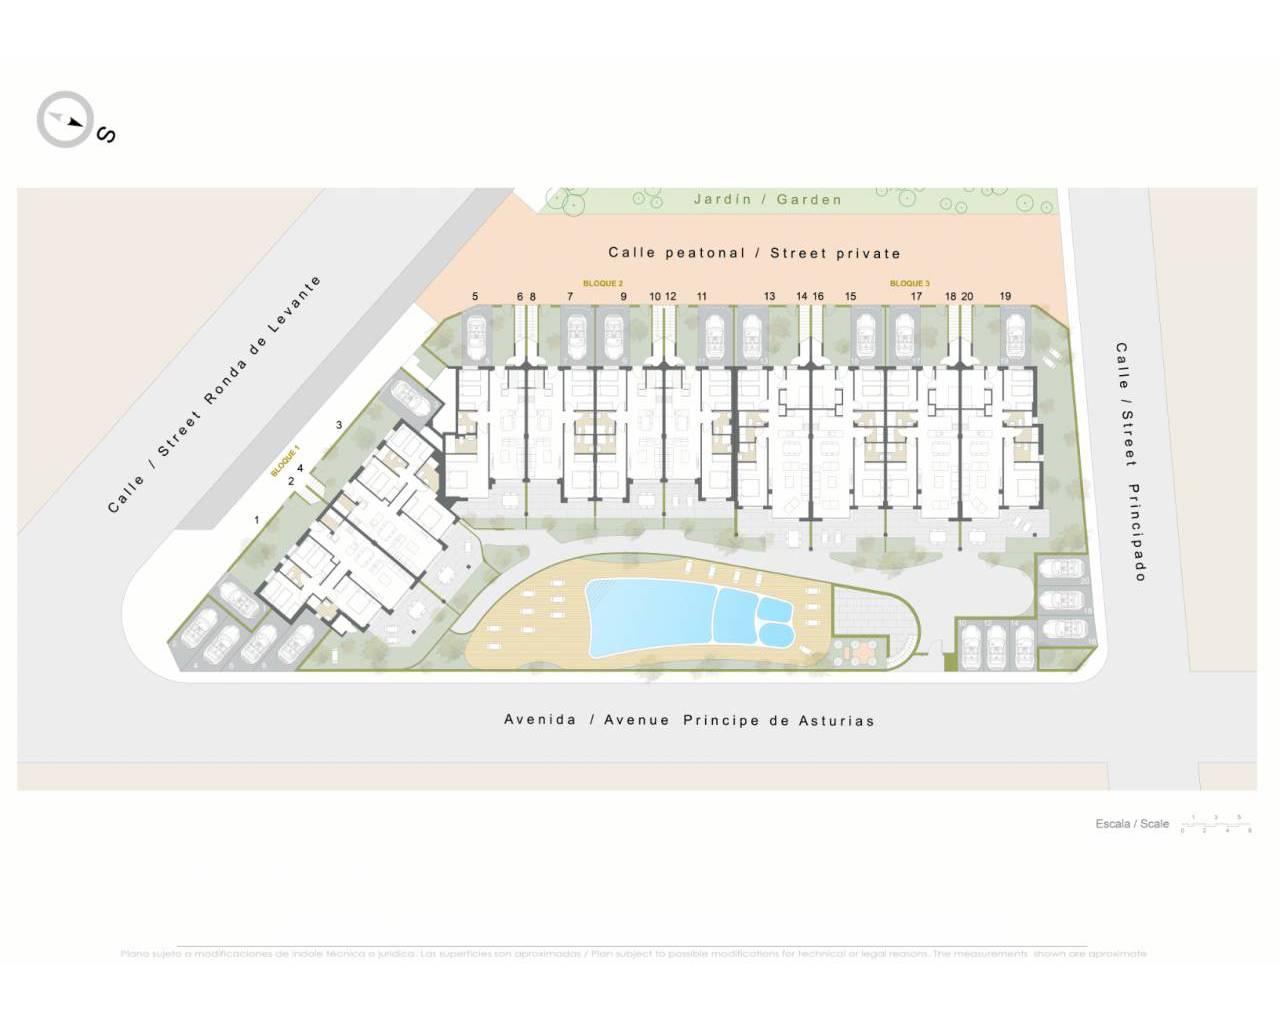 nieuwbouw-appartement-pilar-de-la-horadada_5791_xl